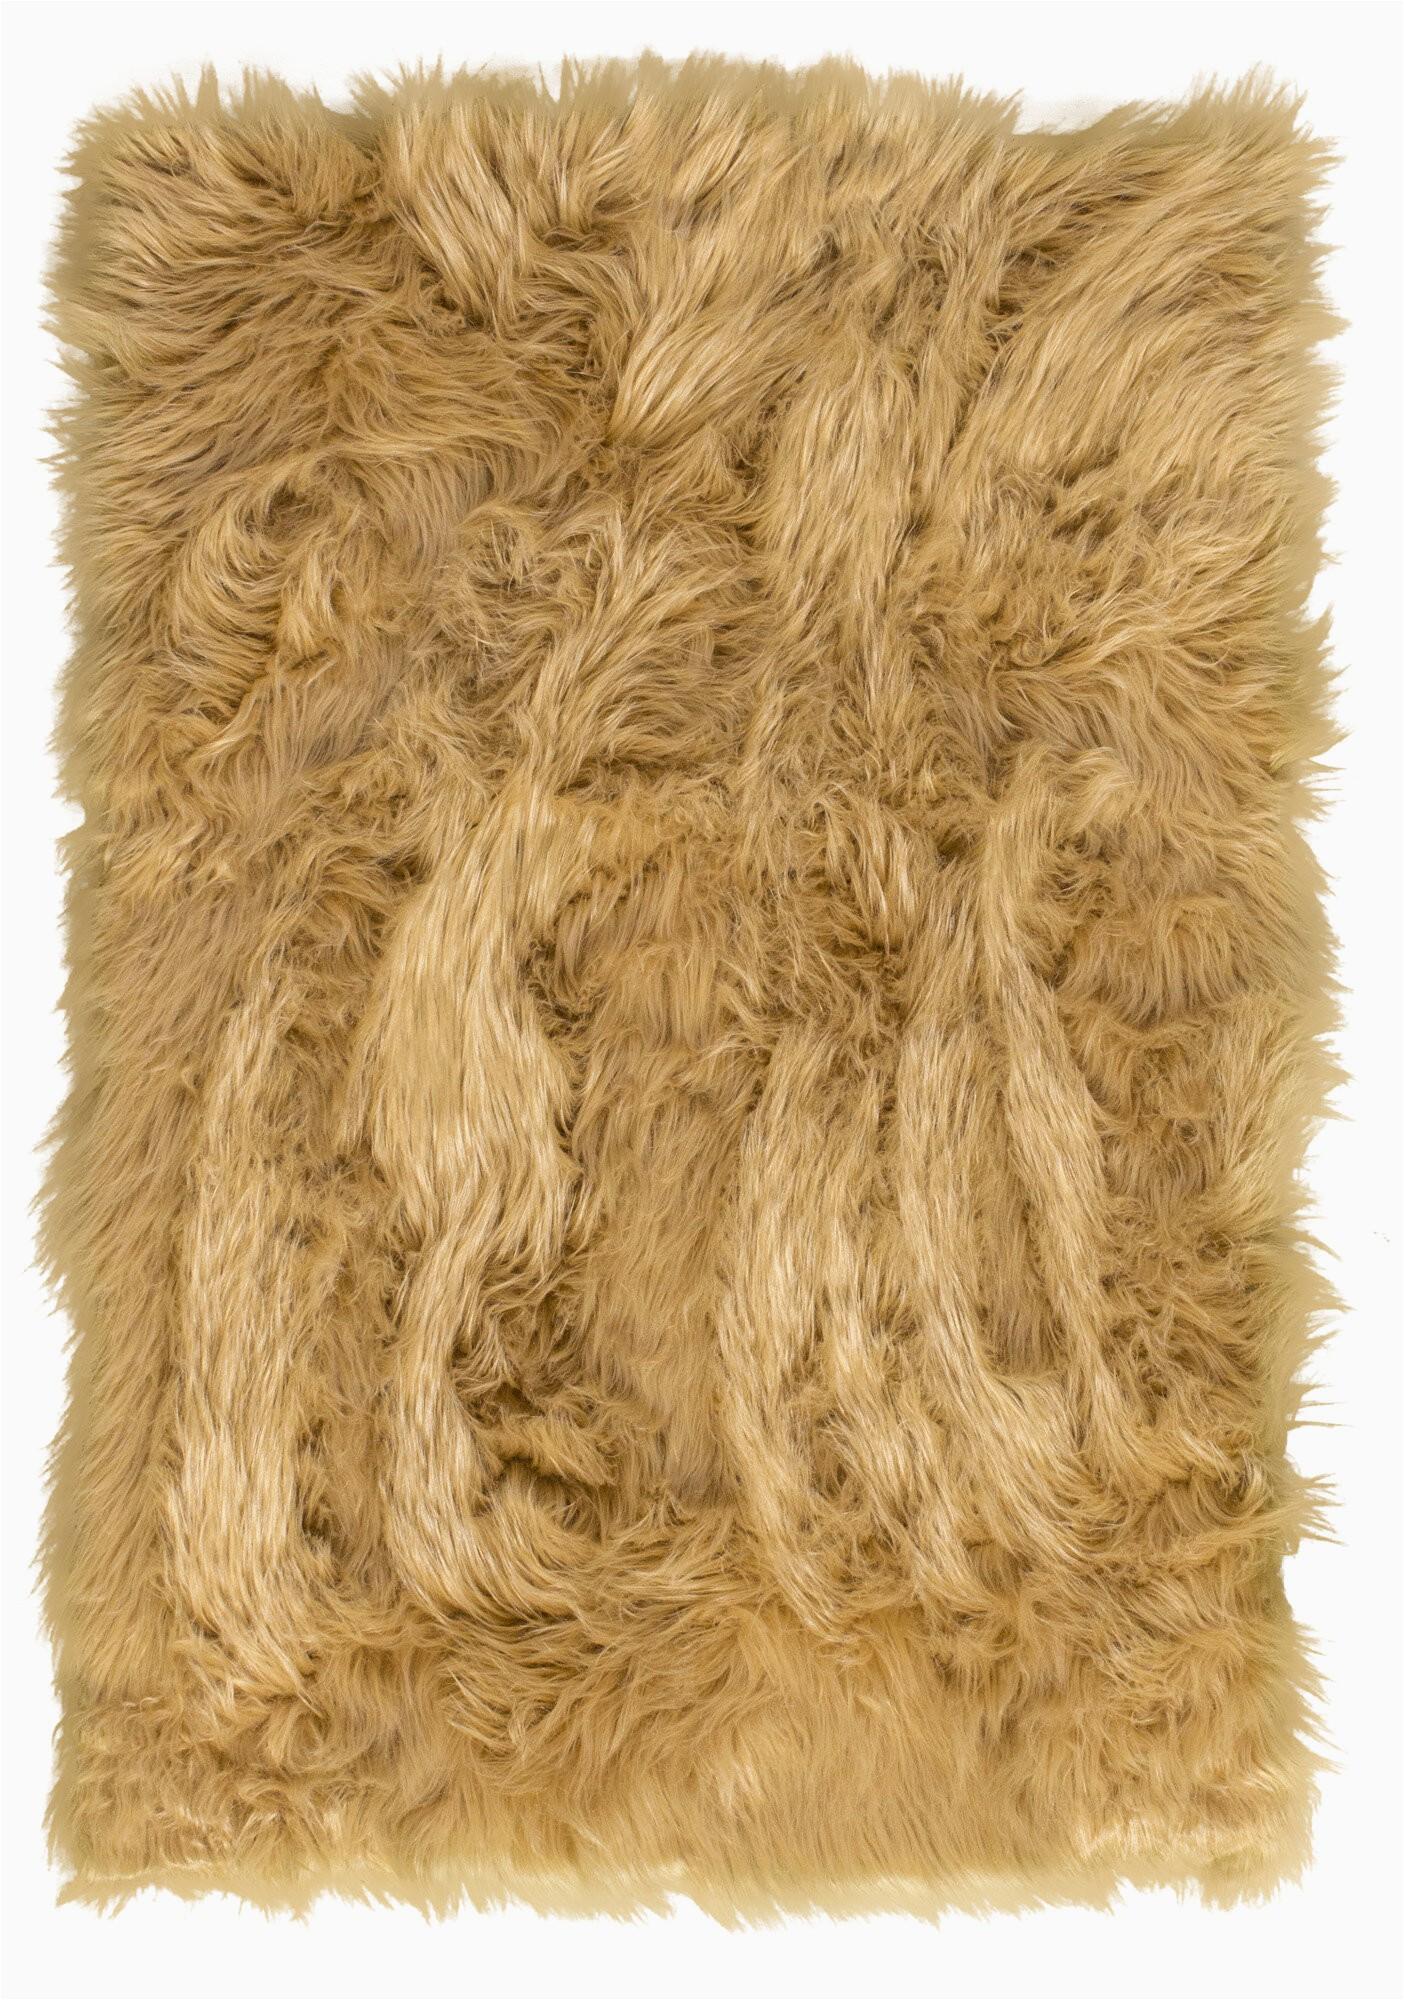 Cheap Faux Fur area Rugs Charlotte Faux Fur Light Brown area Rug